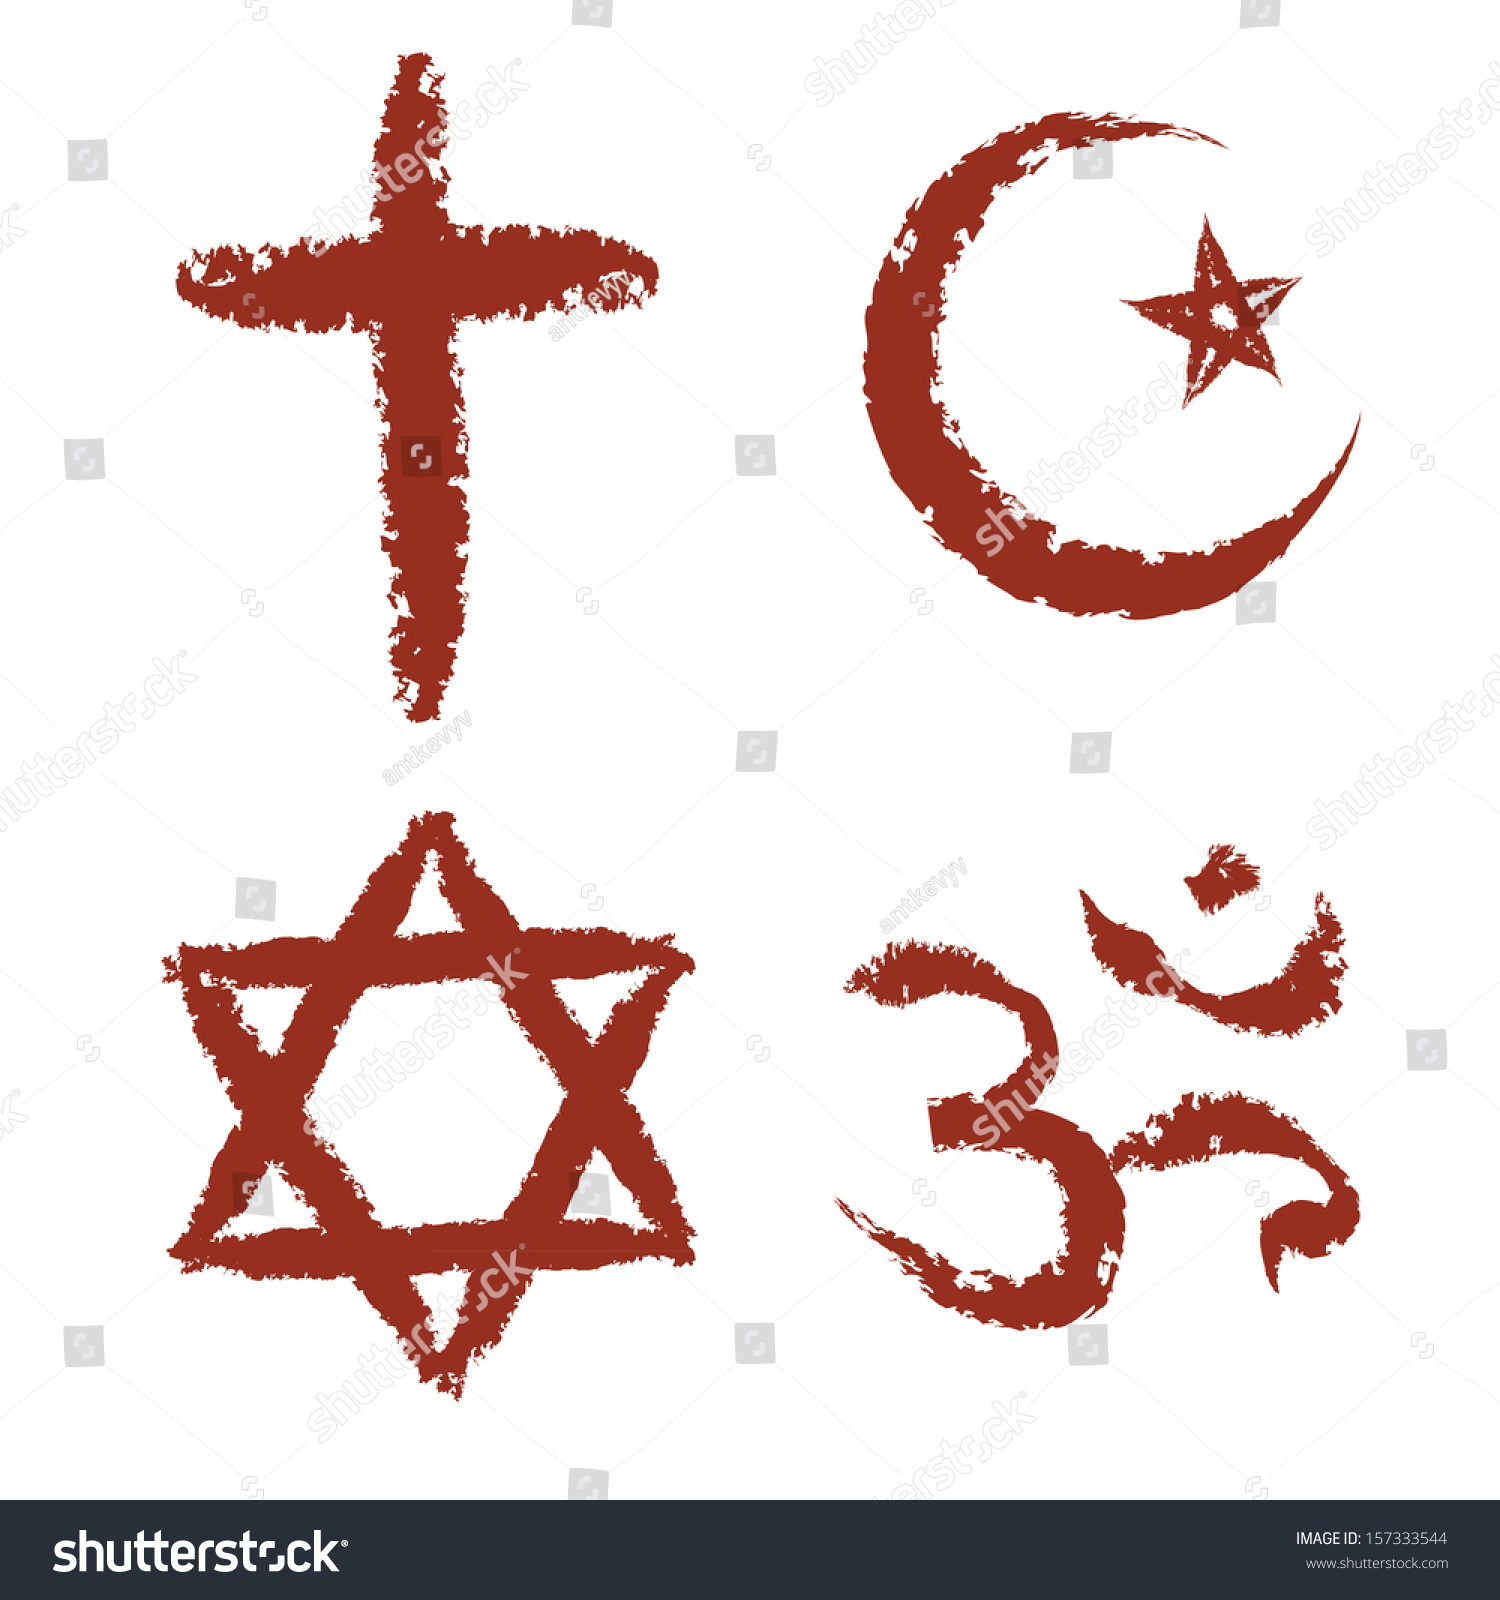 Royalty Free Christian Islam Judaism And Hinduism 157333544